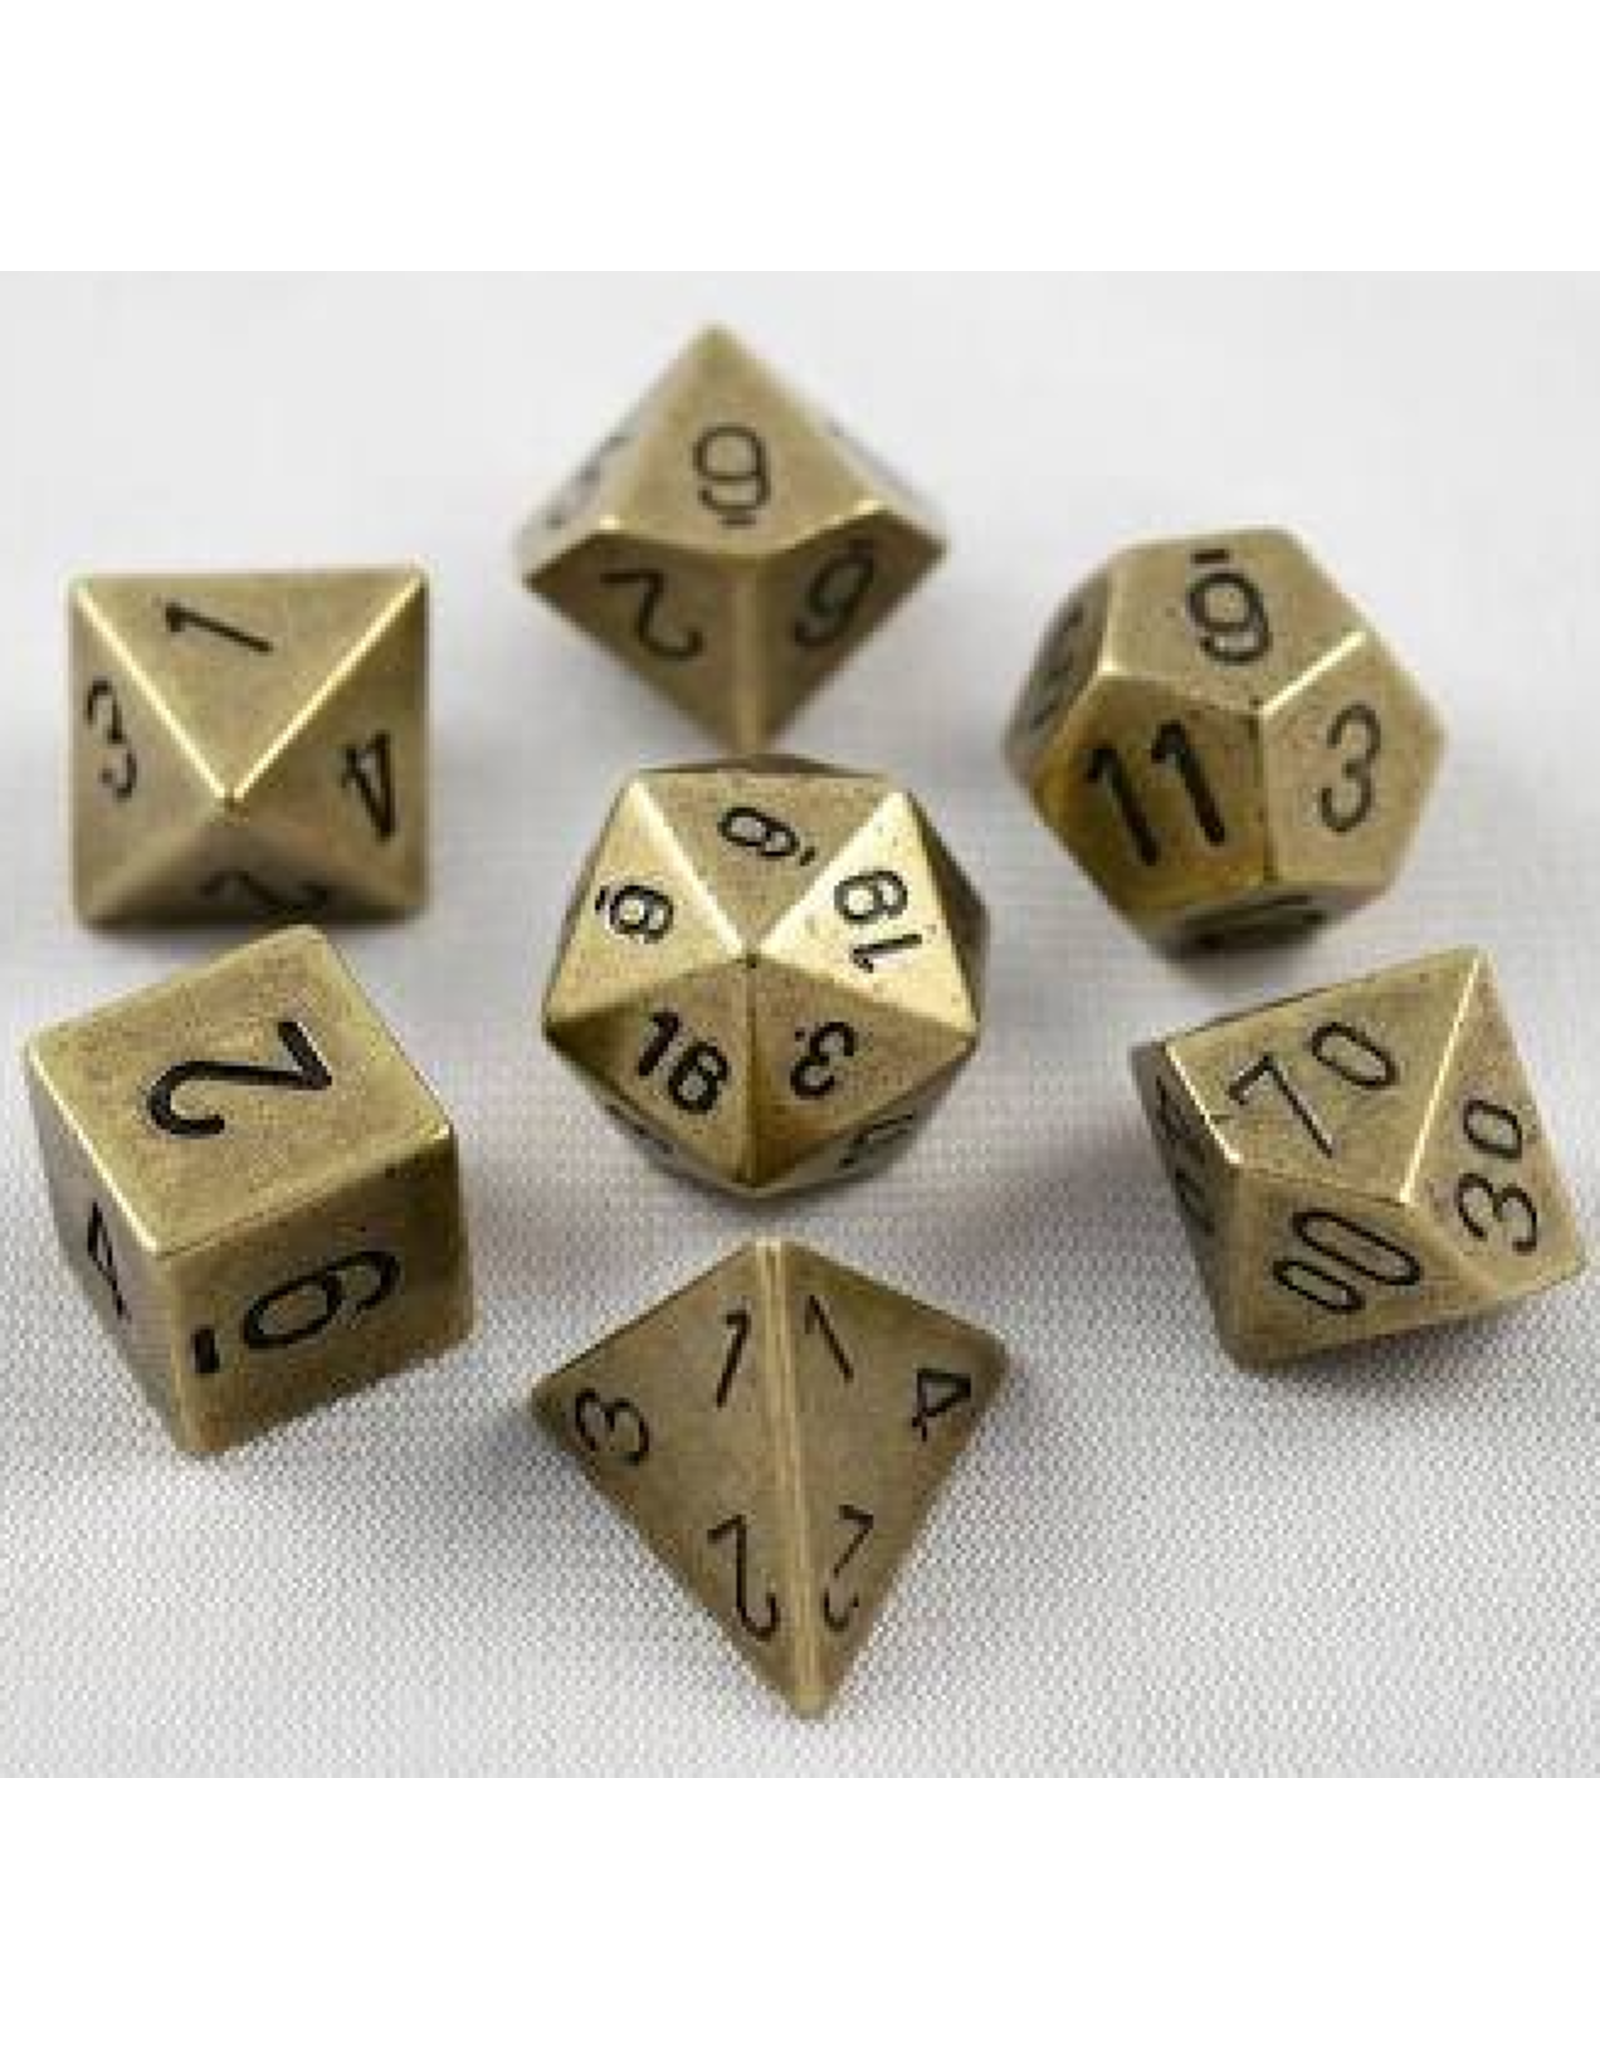 Chessex 7-set metal: Old Brass